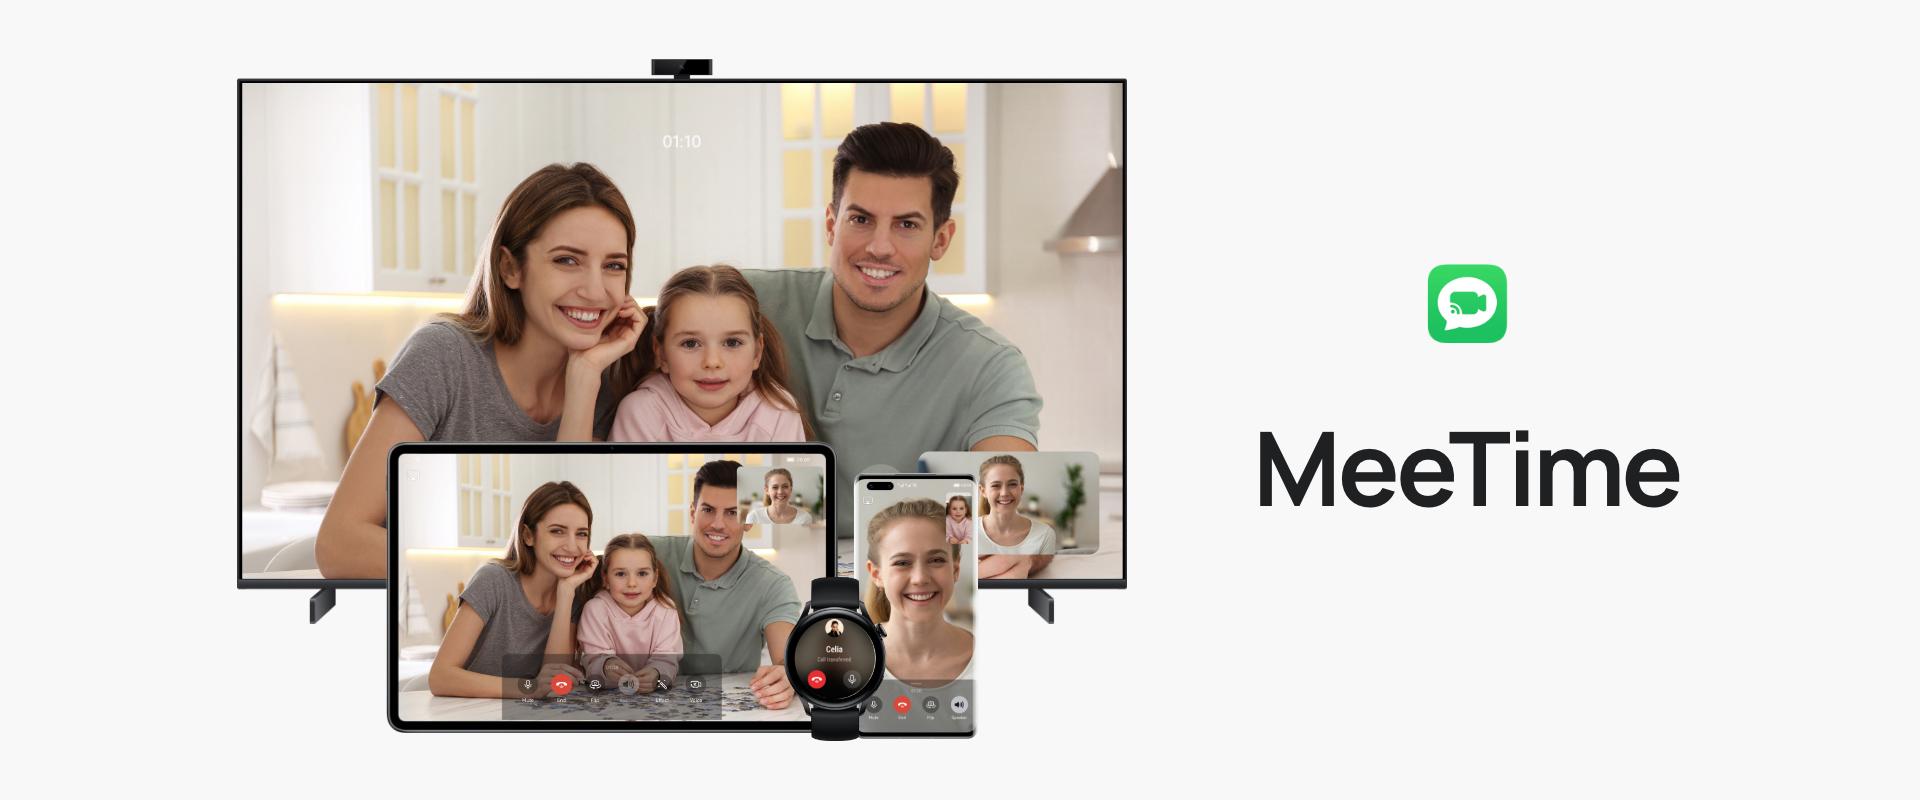 Huawei MeeTime chegou a Portugal